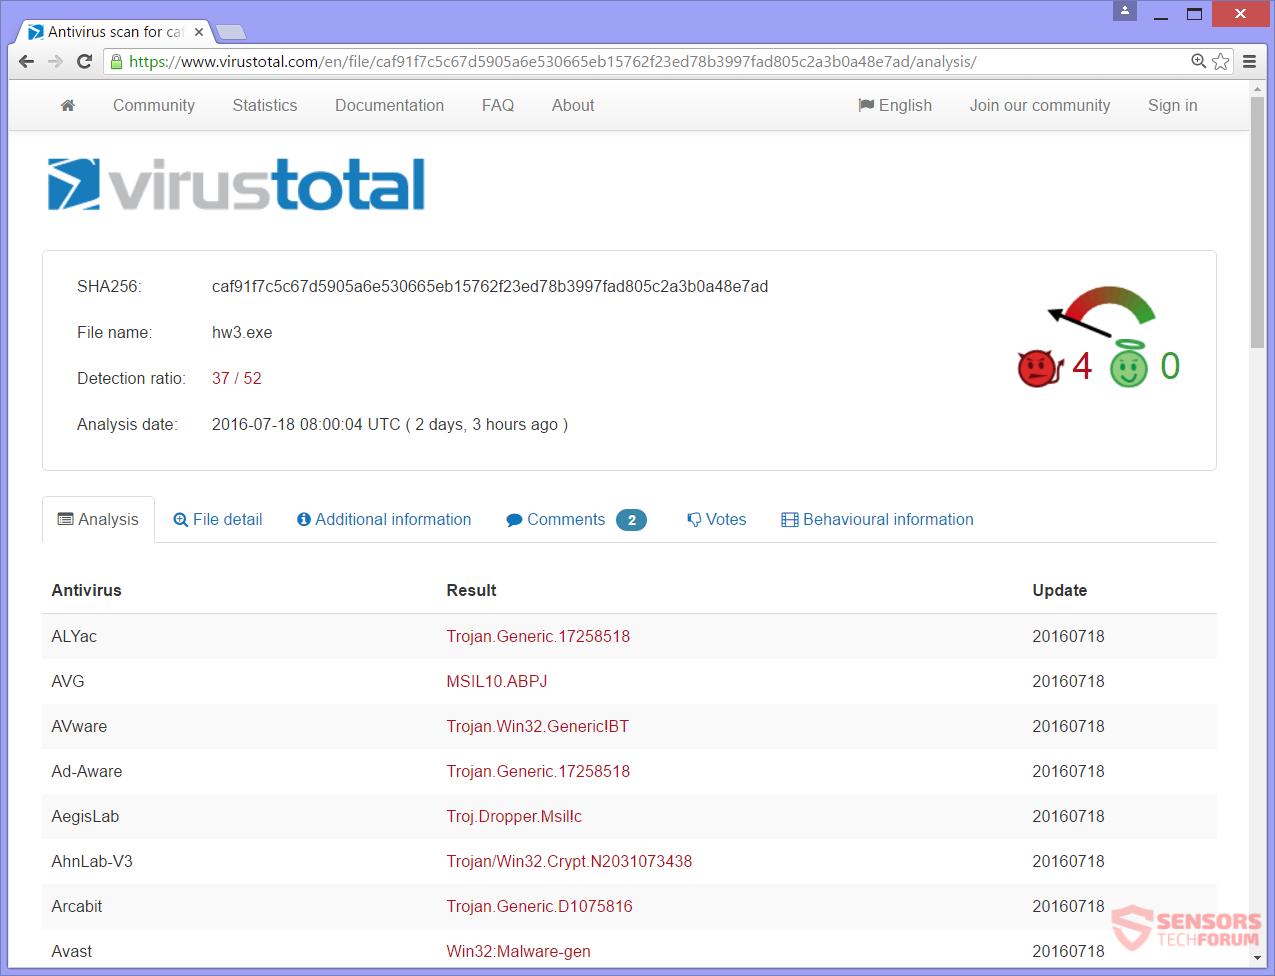 STF-cuteransomware-ransomware-cute-virustotal-virus-total-detection